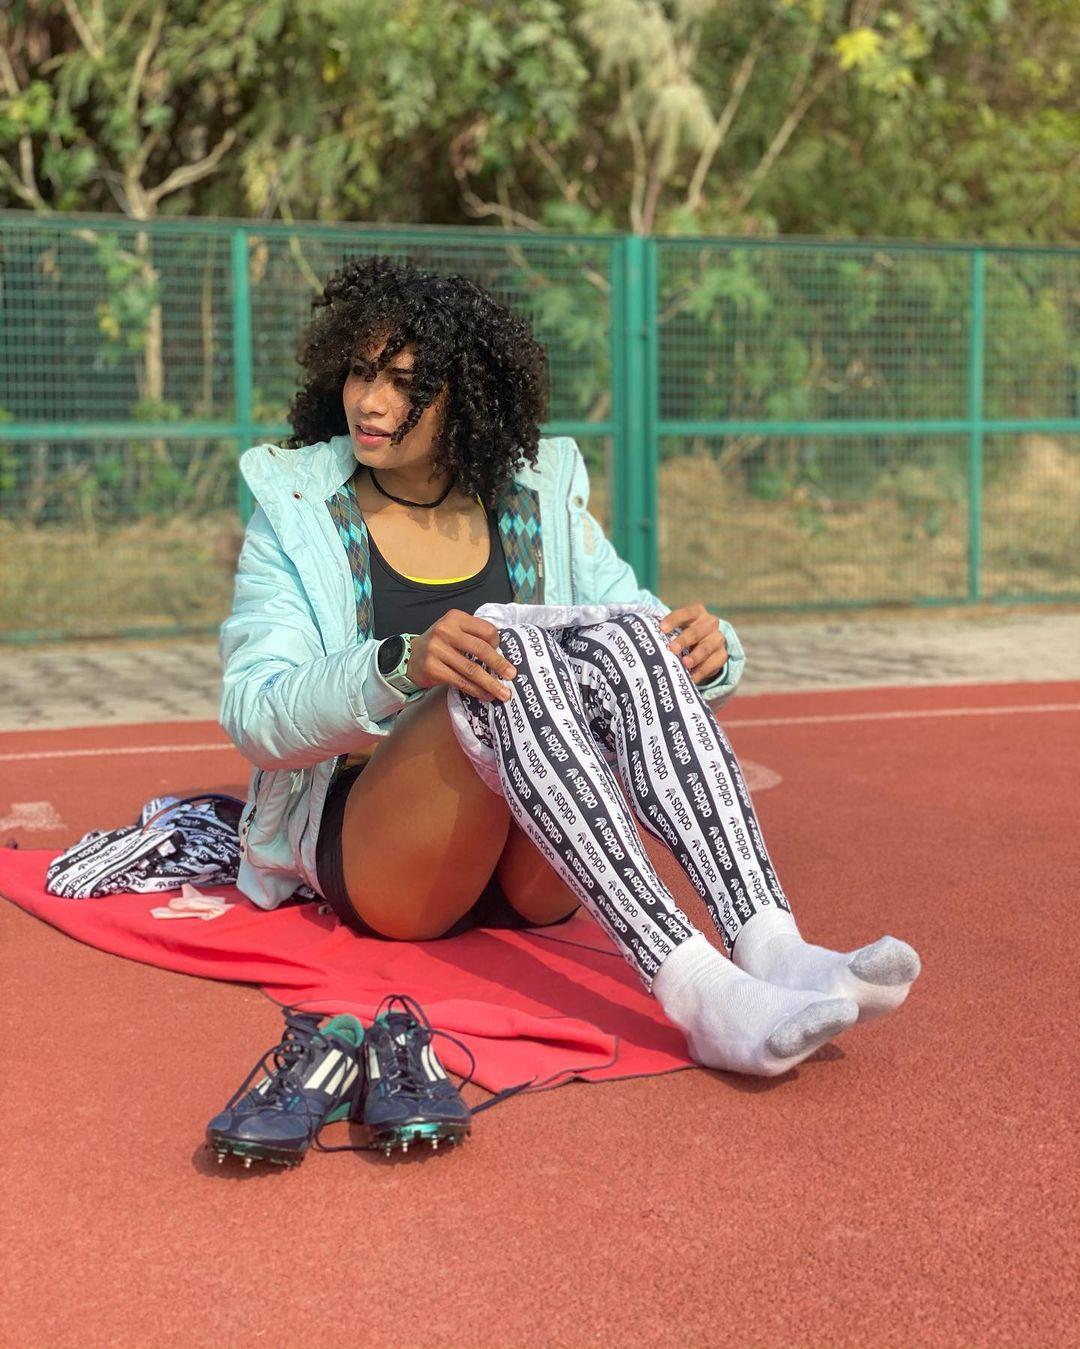 Harmilan Kaur Bains, 1500 meters Race, National Record, हरमिलन कौर बैन्स, राष्ट्रीय ओपन एथलेटिक्स चैंपियनशिप, National Open Athletics Championships